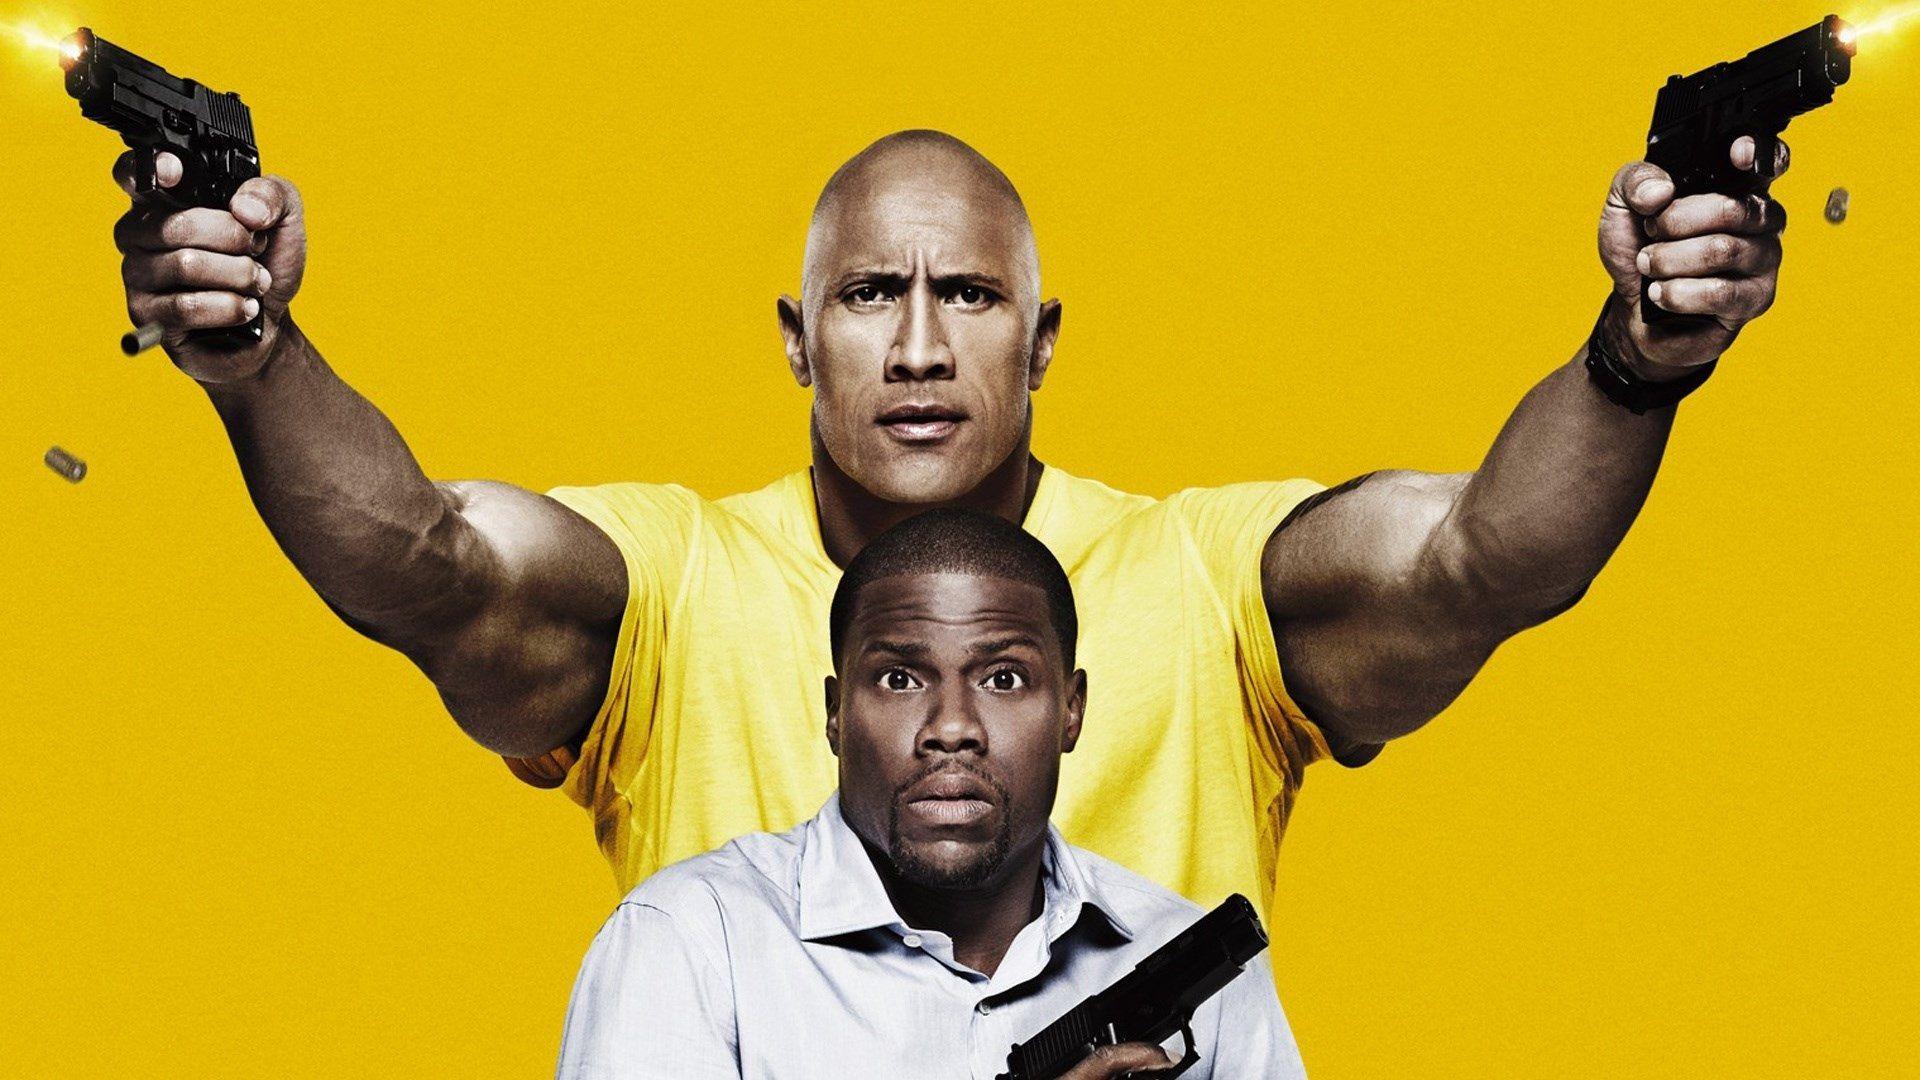 dwayne johnson movie football player